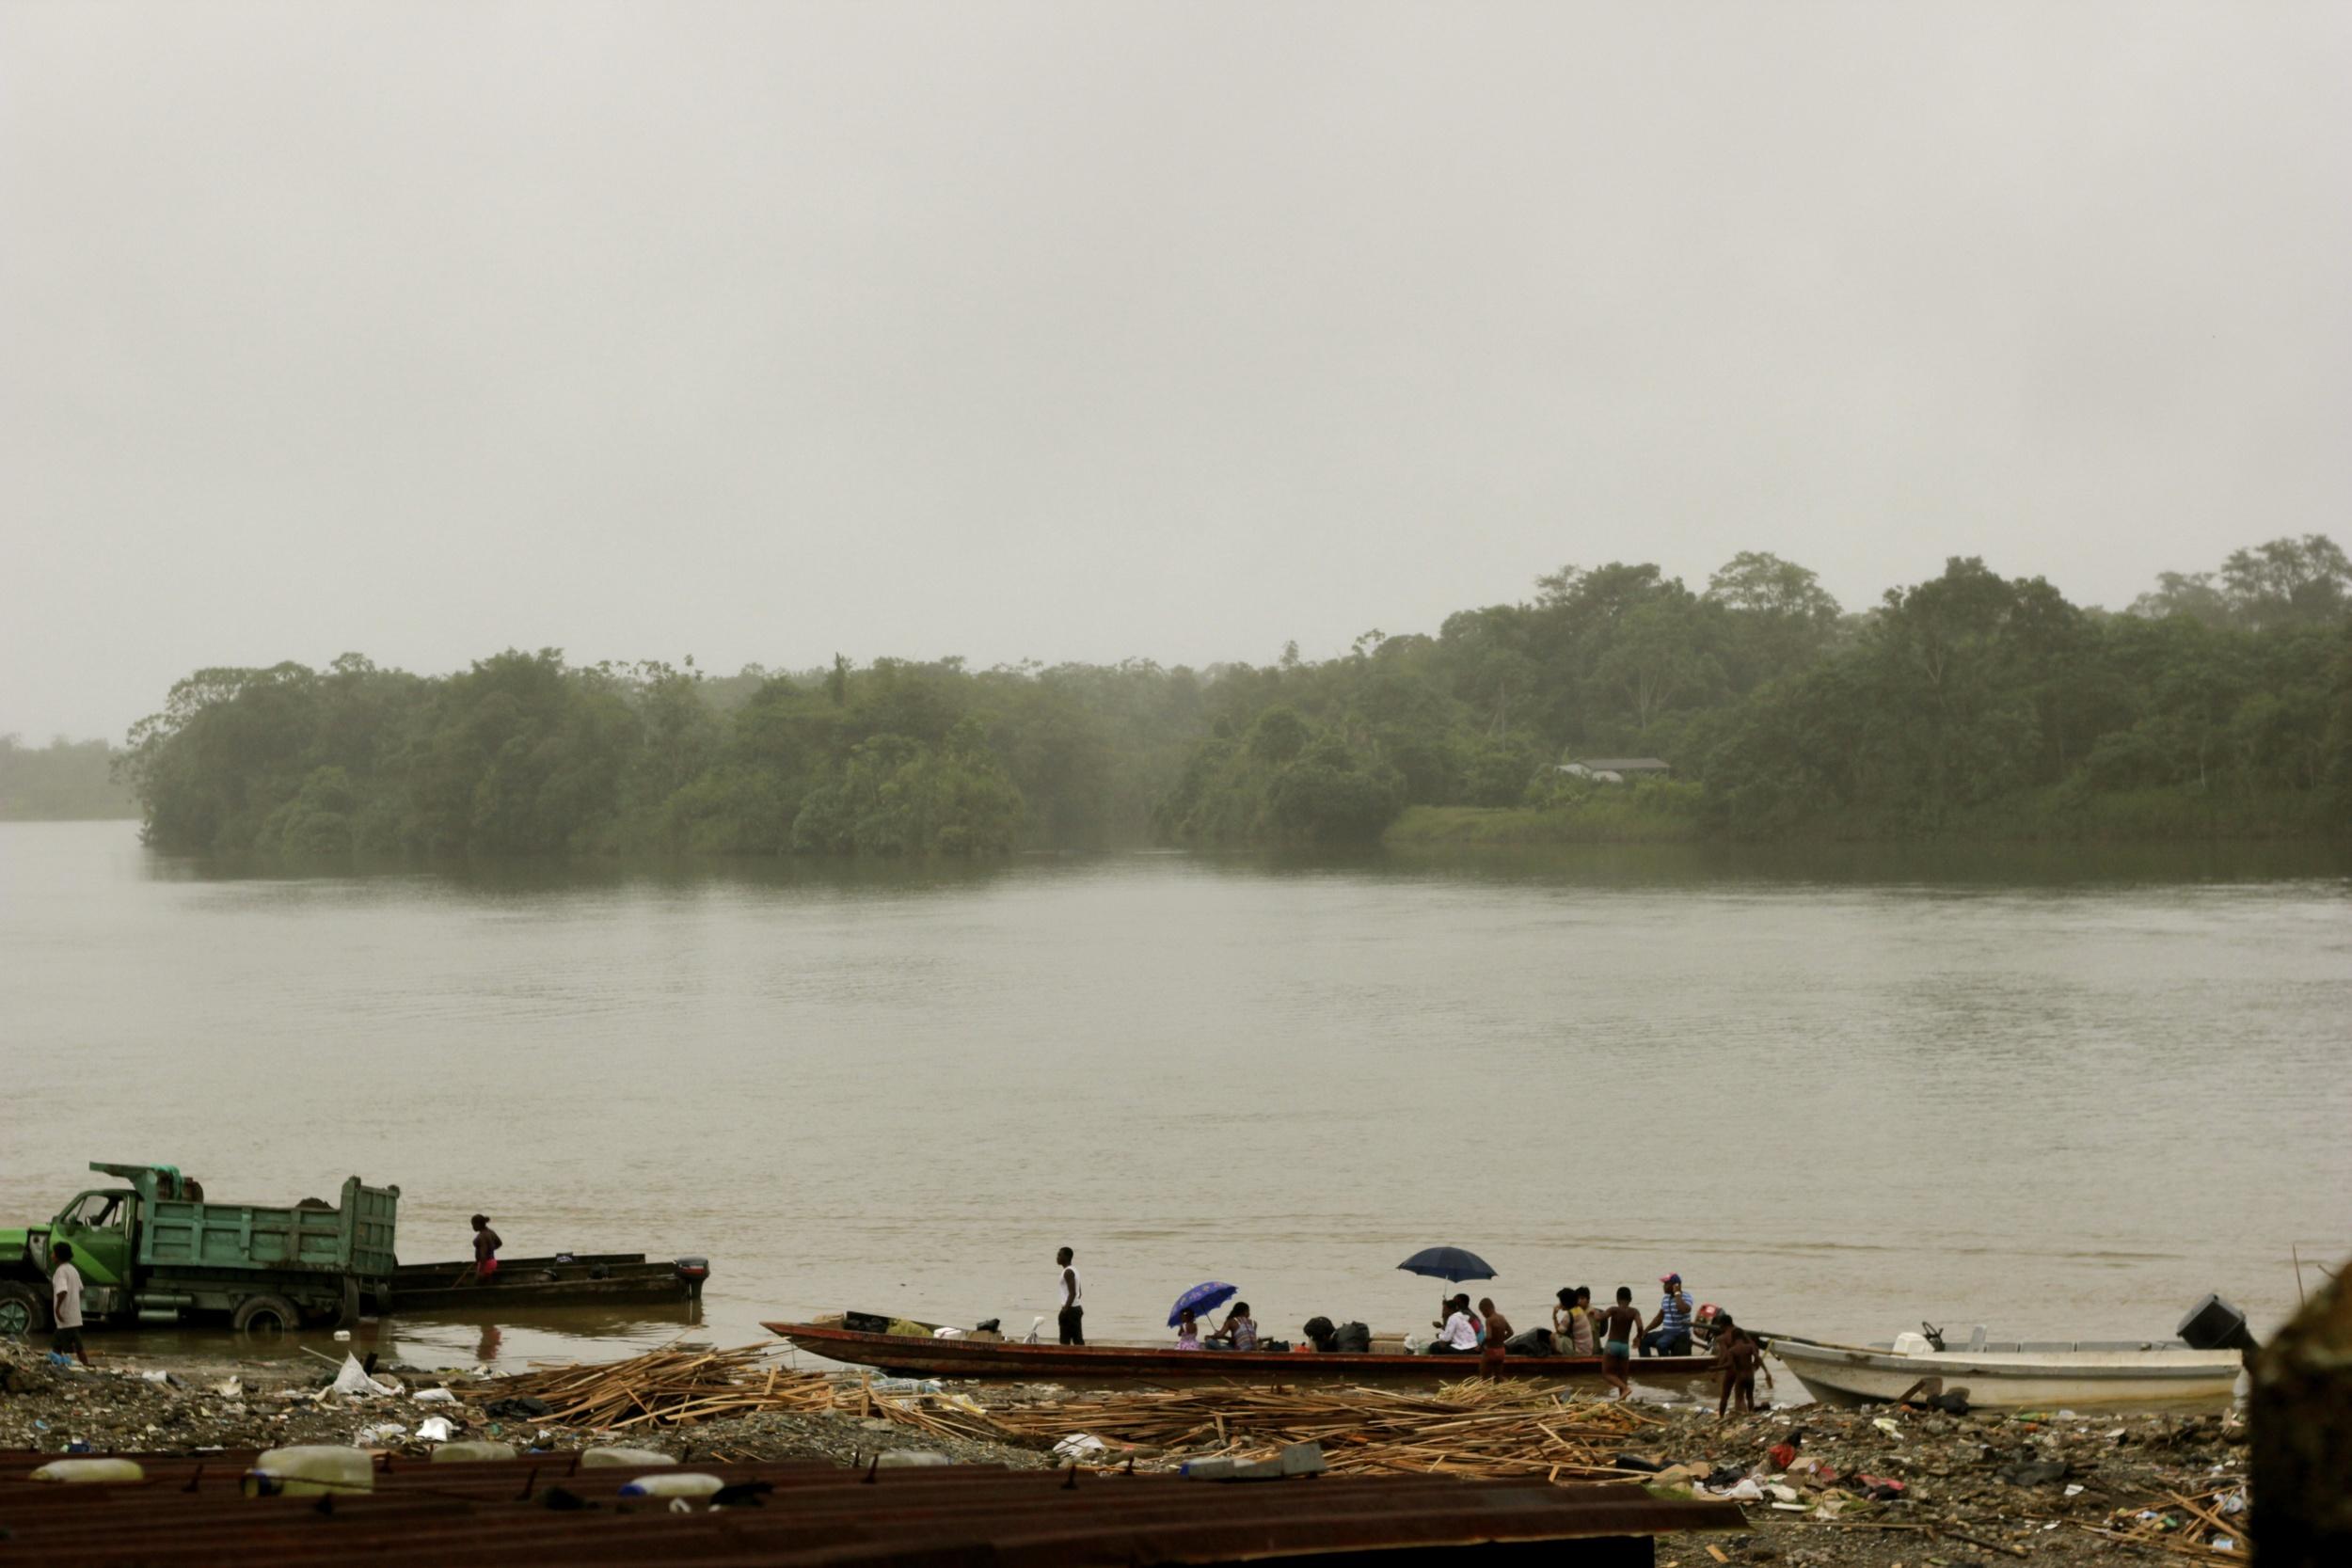 Río Atrato. Quibdó, 2011.